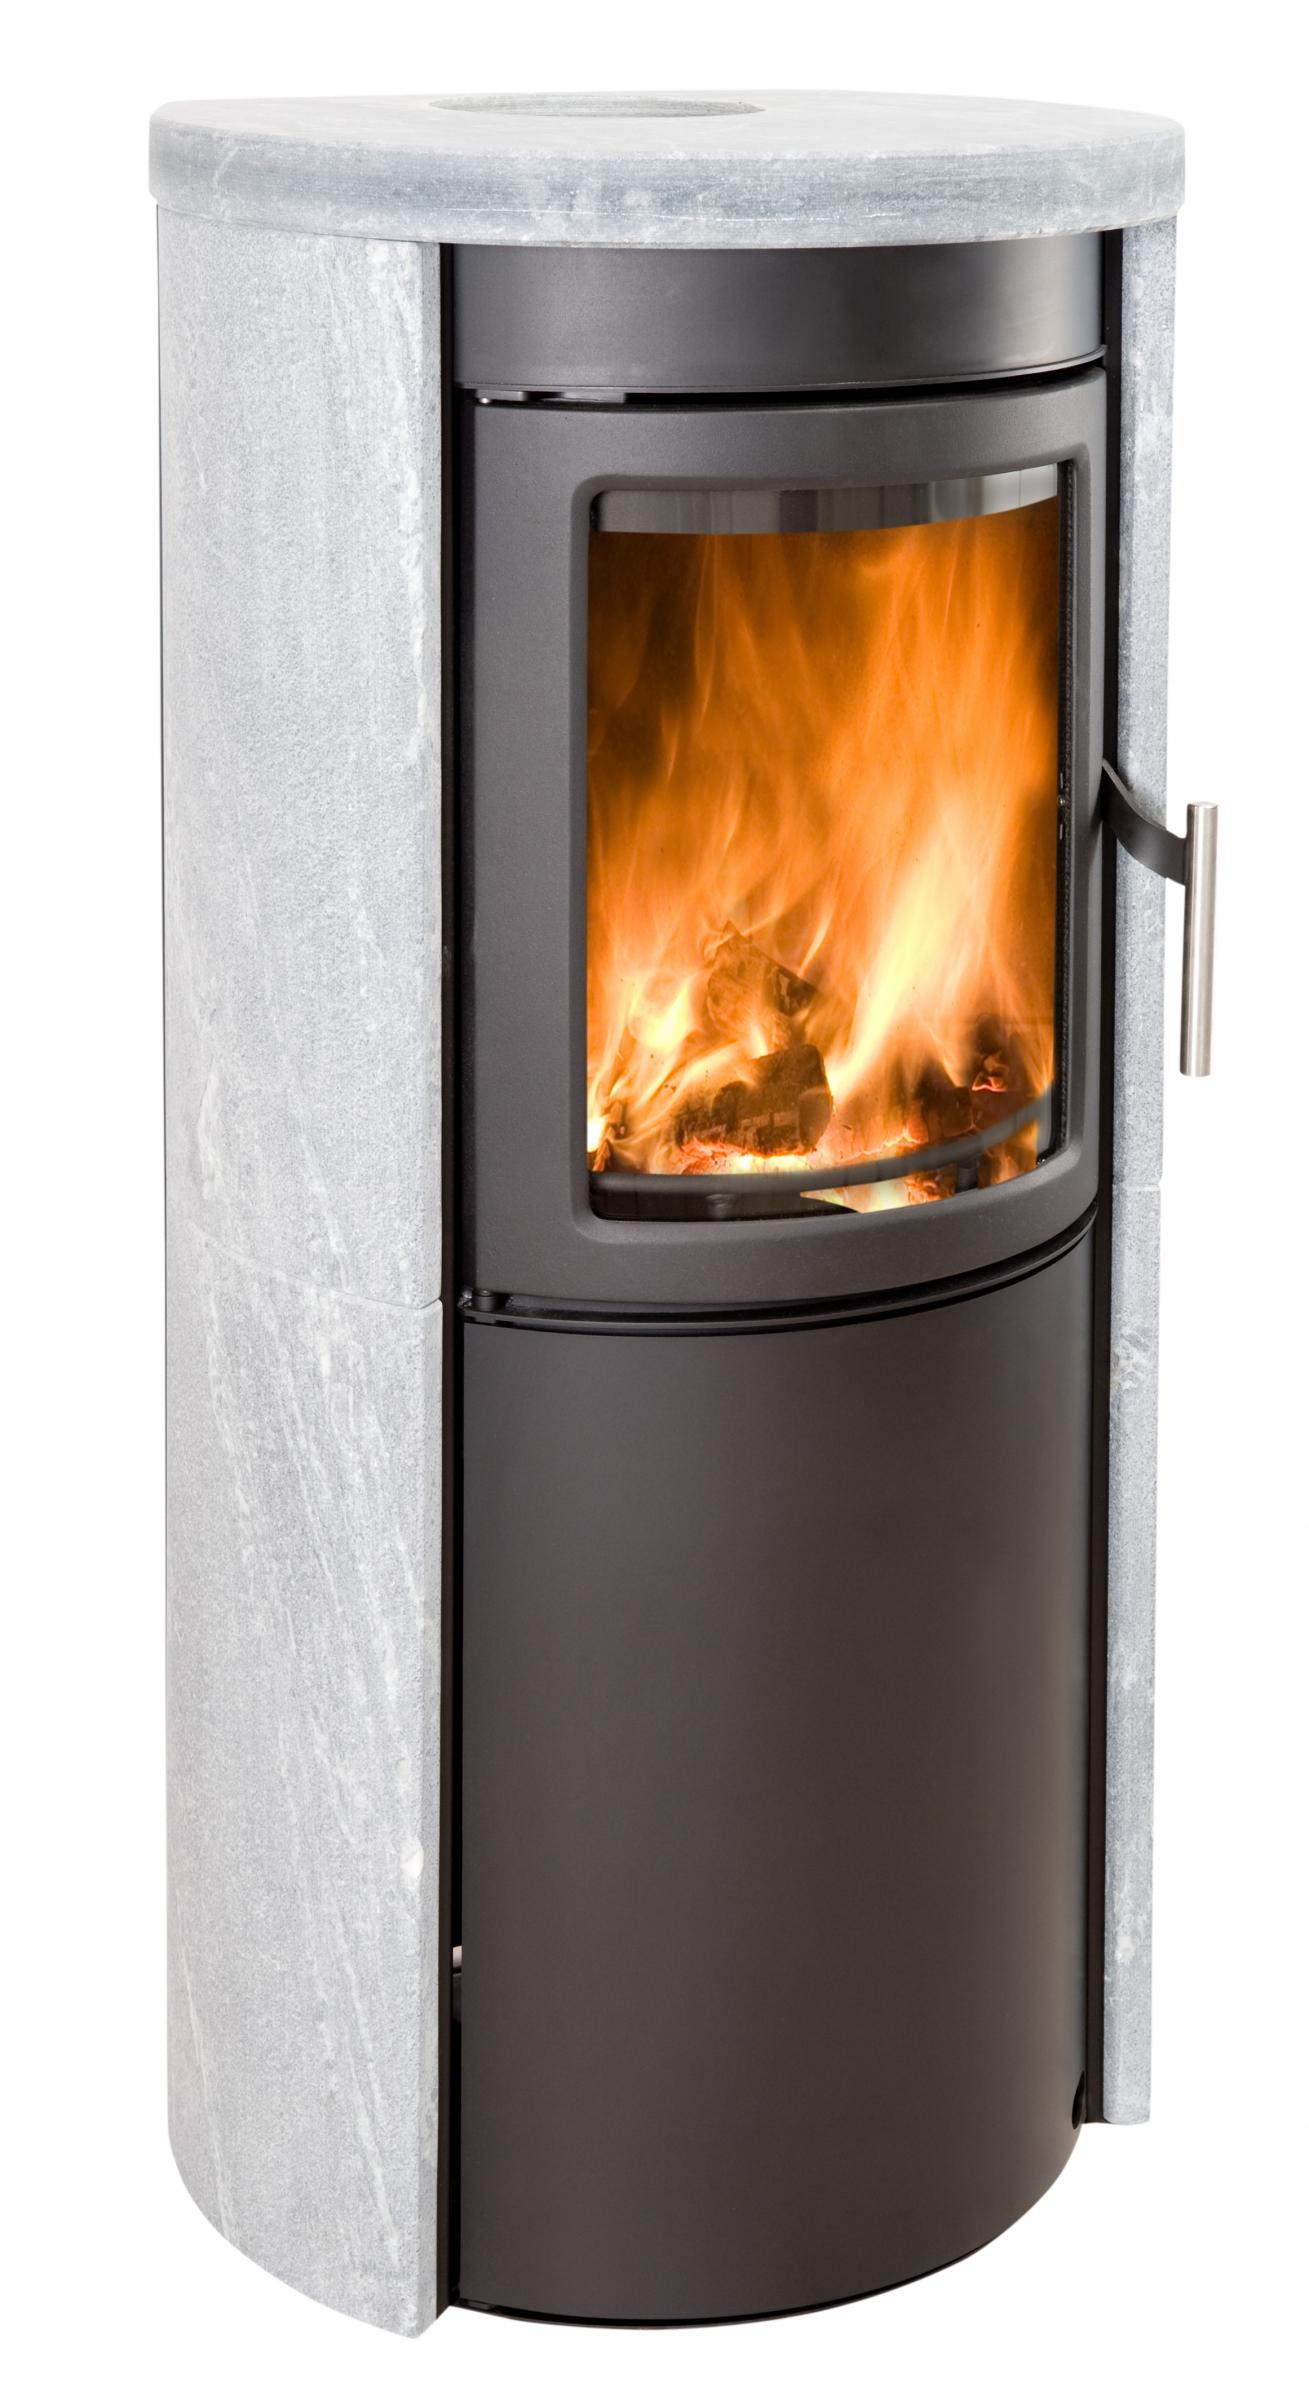 heta 510 ollaire r f chauffage po les bois standard espace po le scandinave. Black Bedroom Furniture Sets. Home Design Ideas